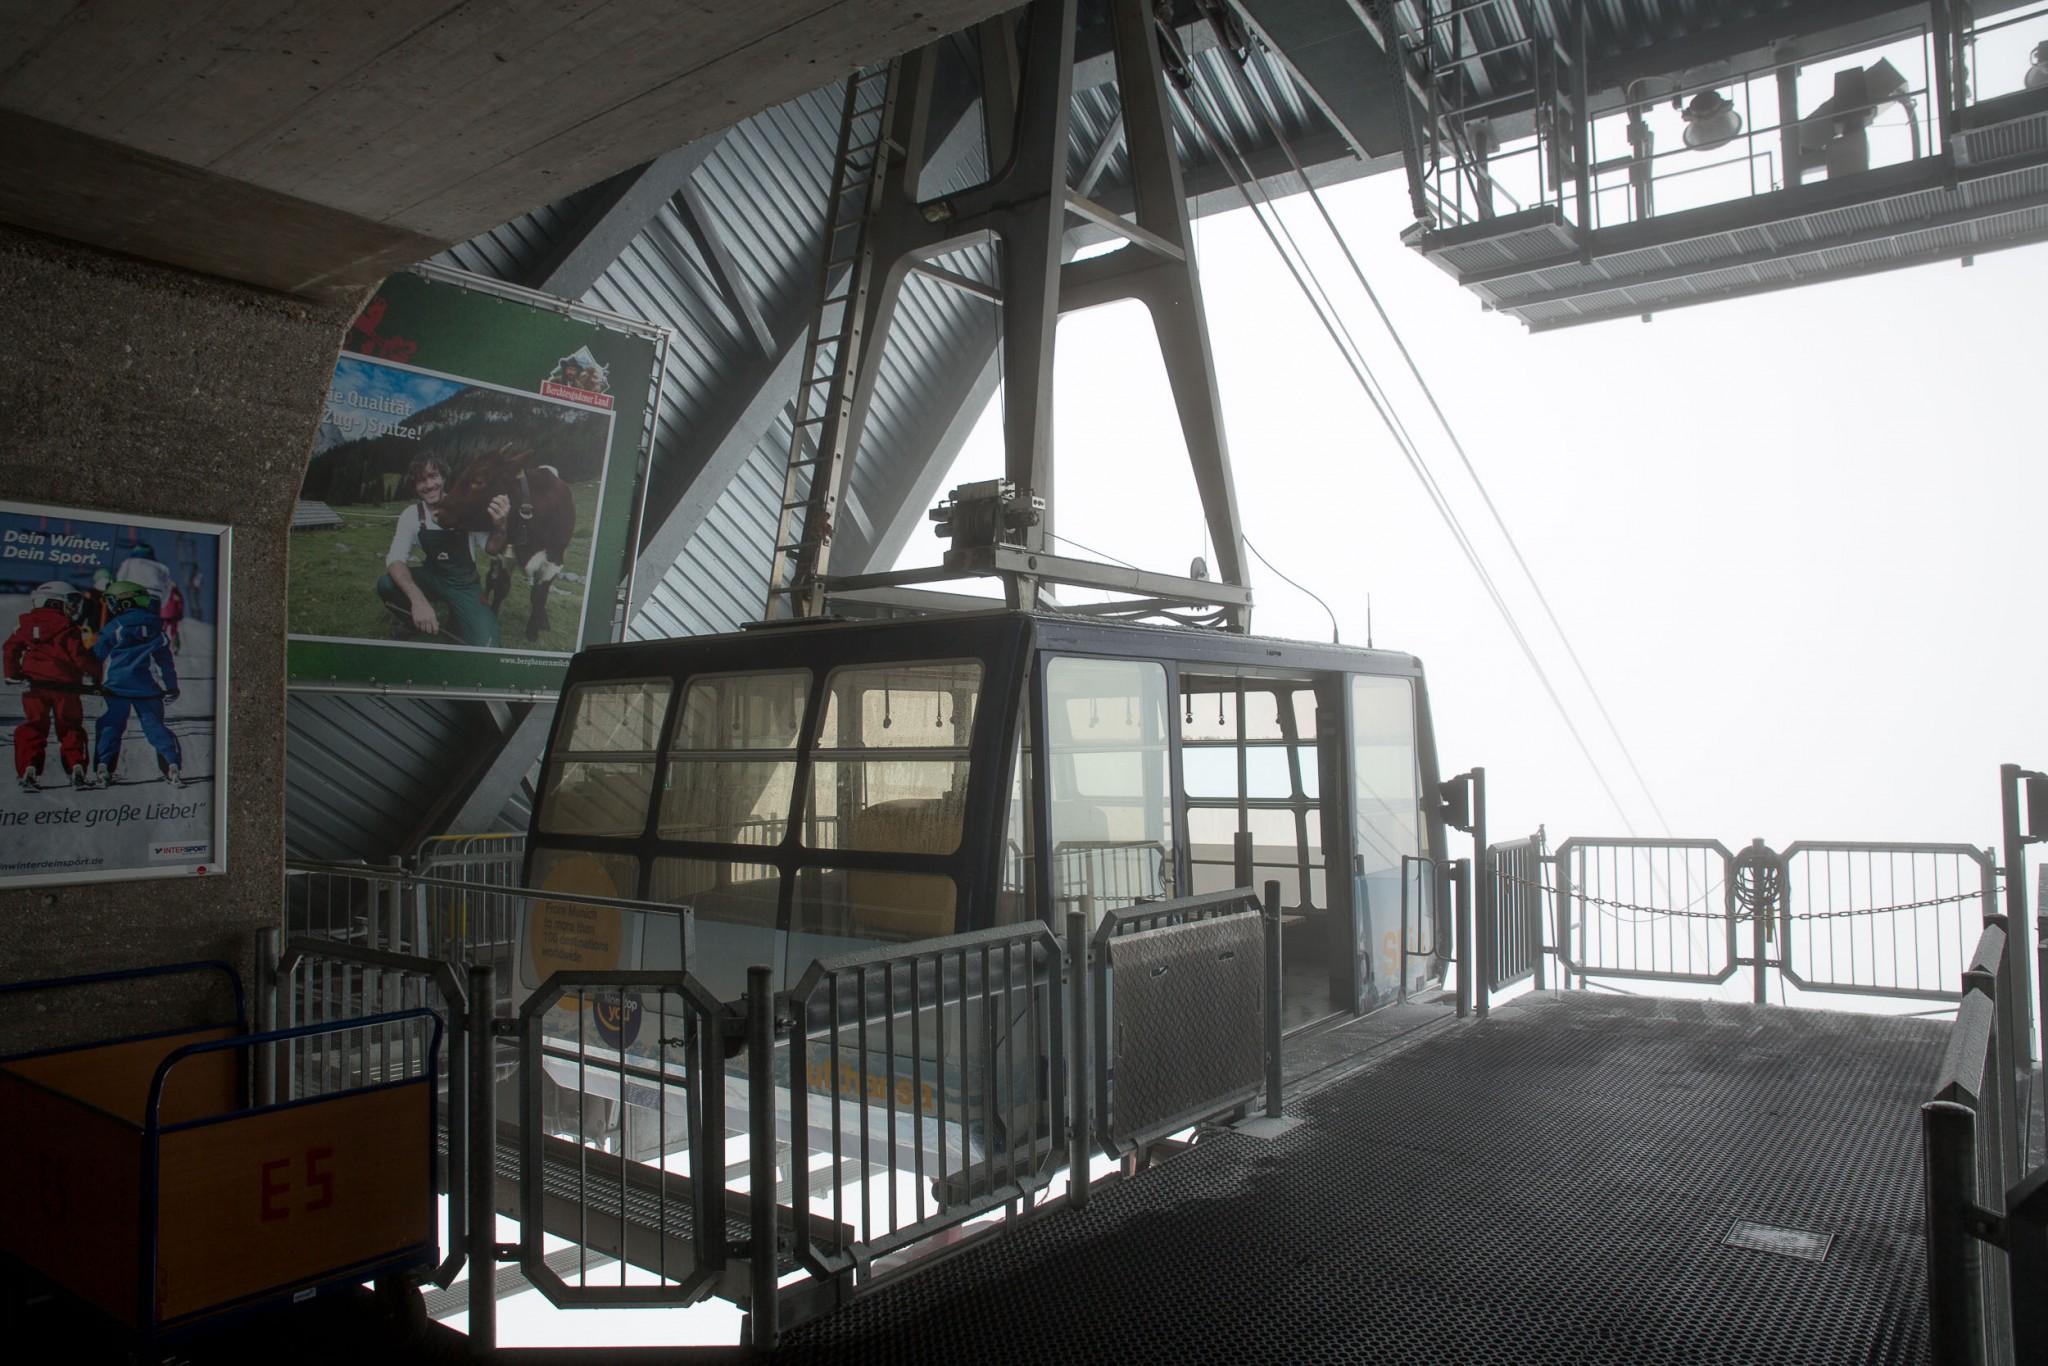 Gletscherbahn - Gondel